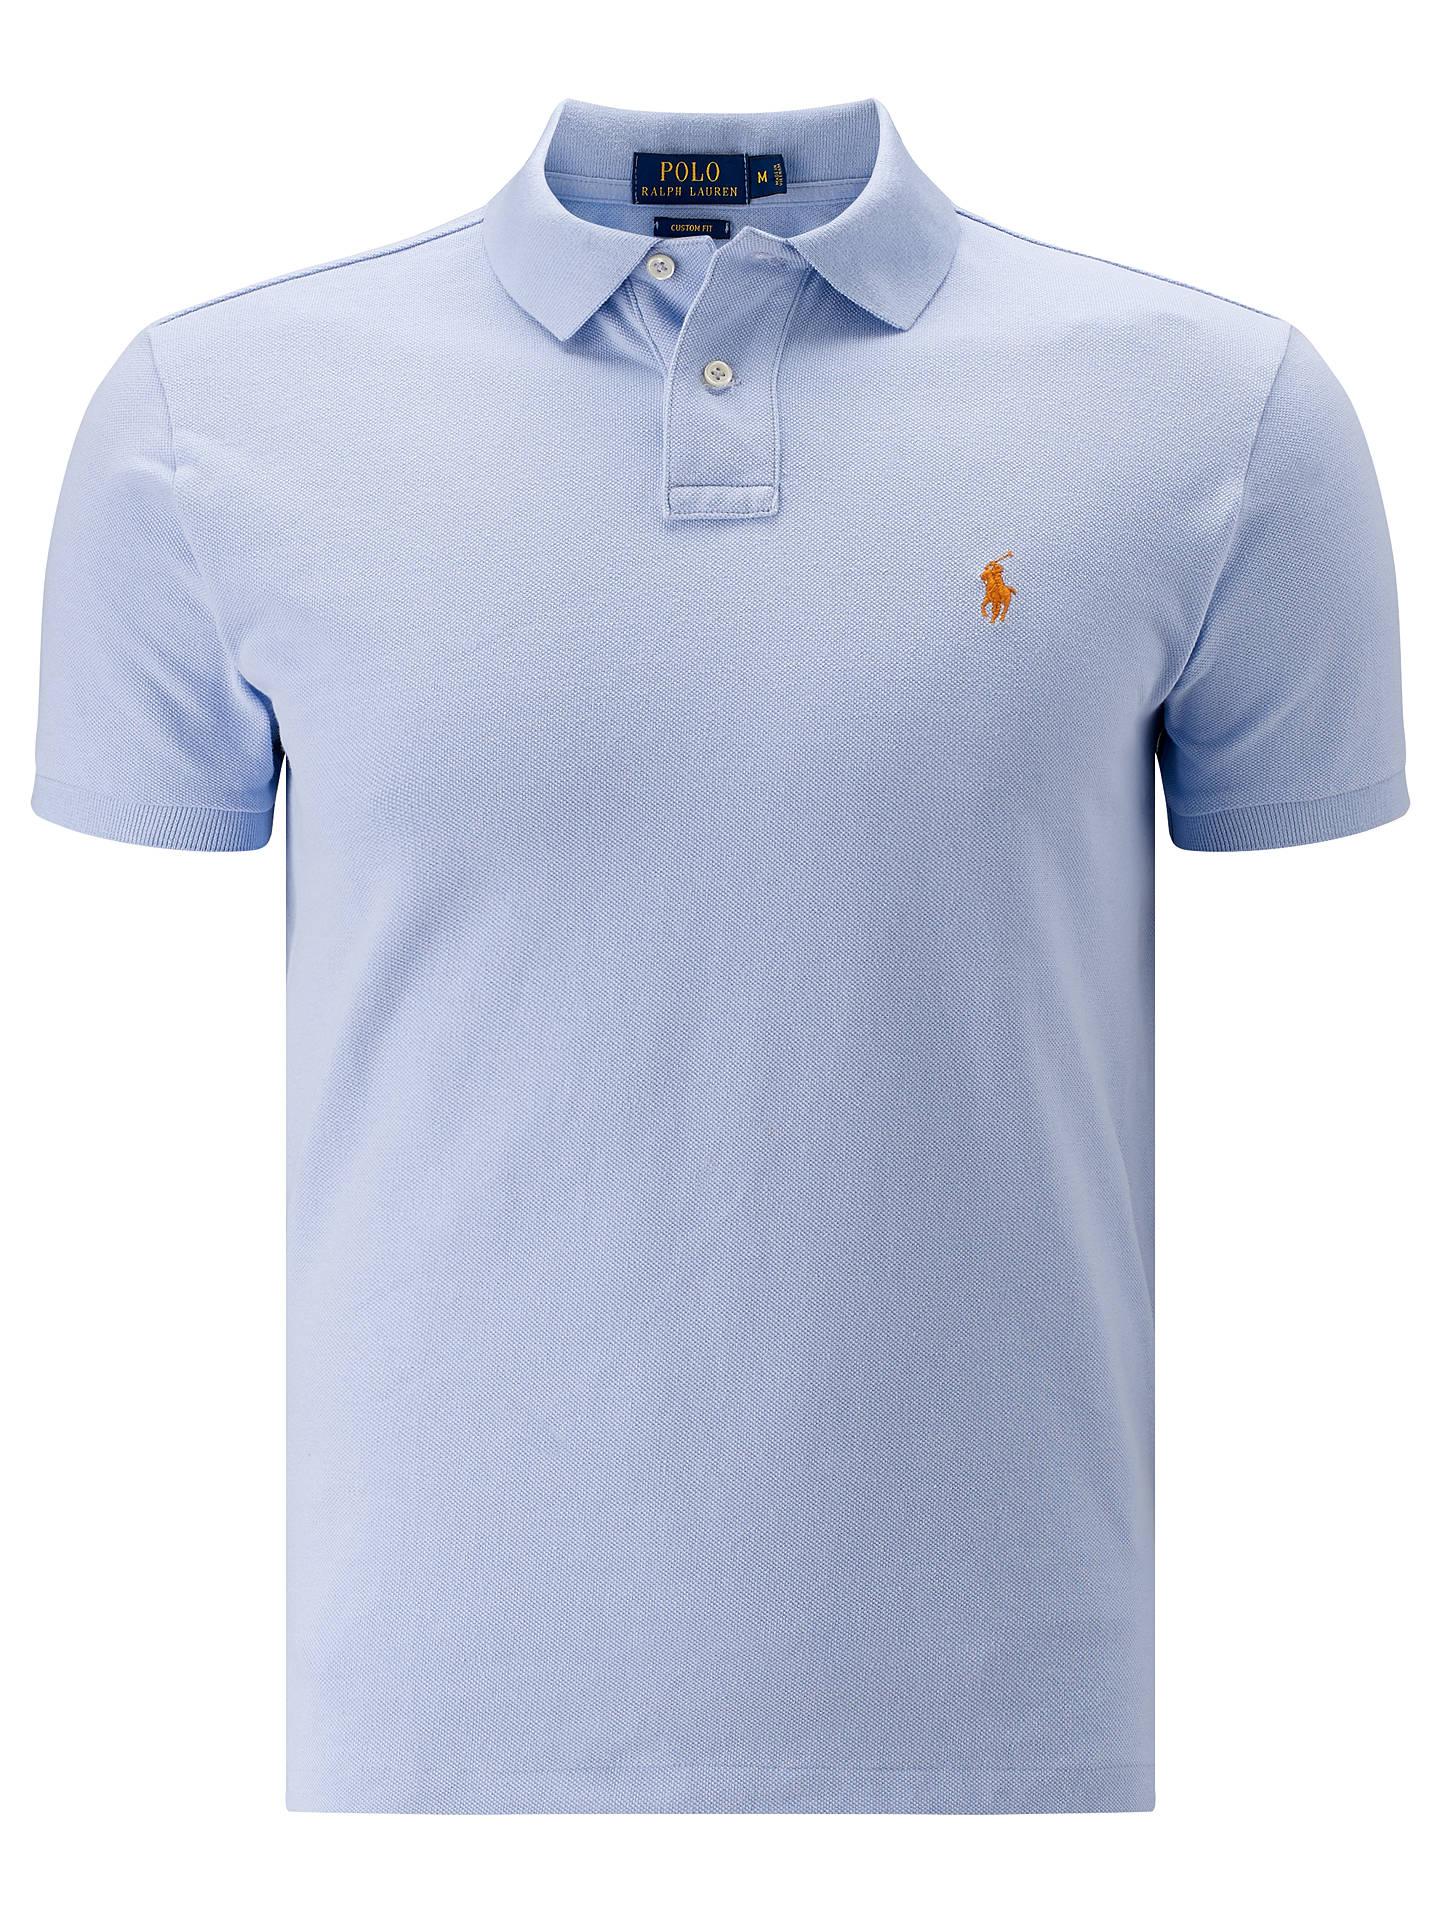 5c653db5fb4c Polo Ralph Lauren KC Custom Fit Cotton Polo Shirt at John Lewis ...